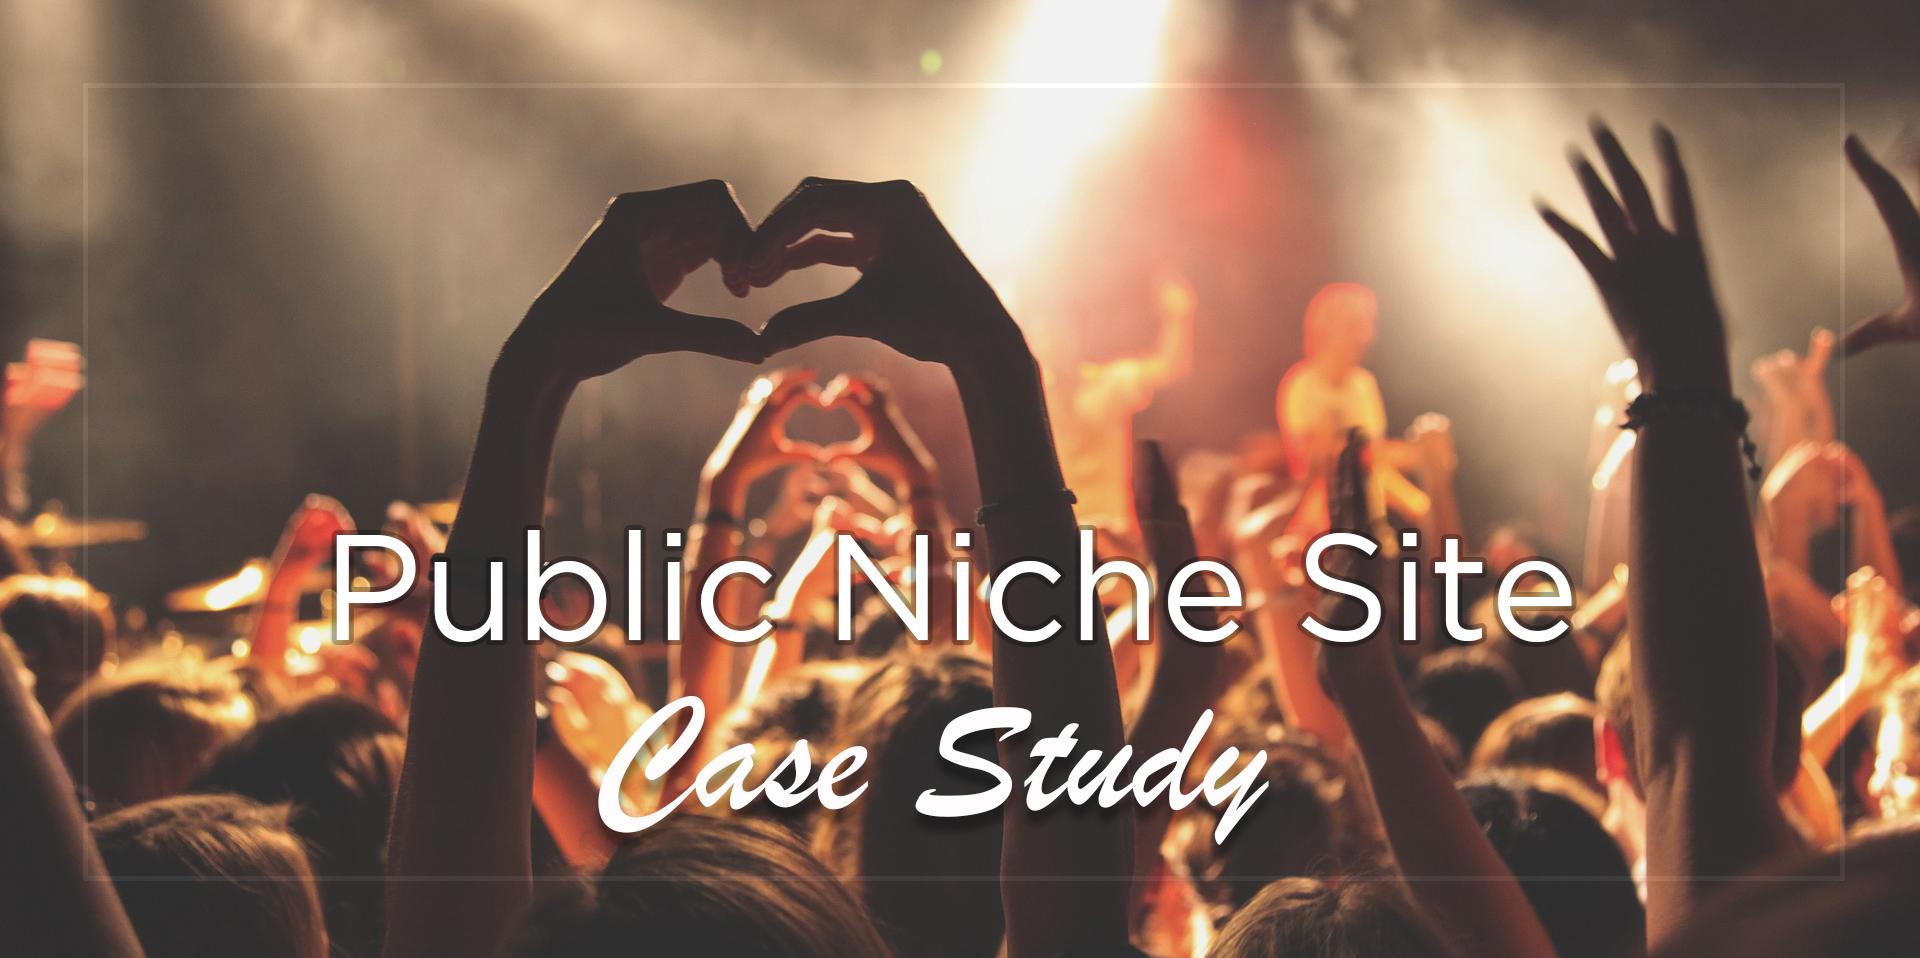 Public Niche Site Case Study